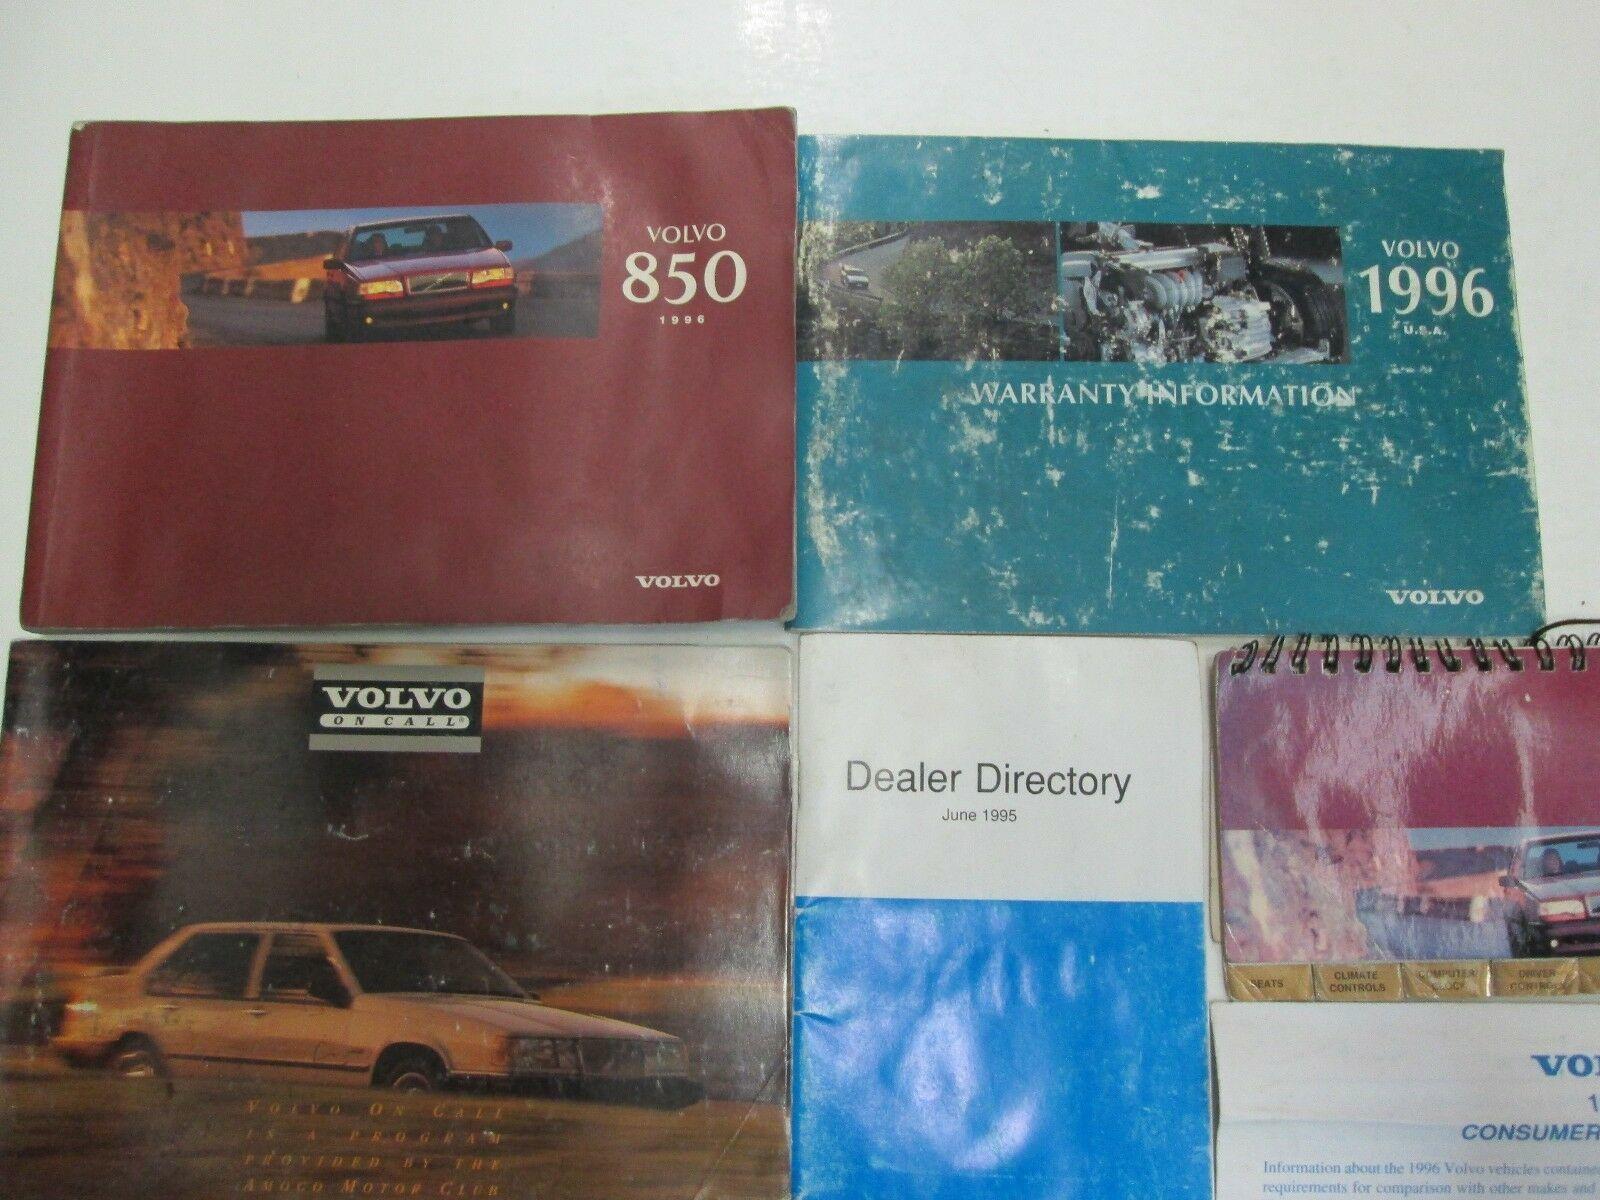 1996 Volvo 850 Owners Manuell Set Wasser Beschädigt Neu Fabrik OEM Buch 96 *** image 3